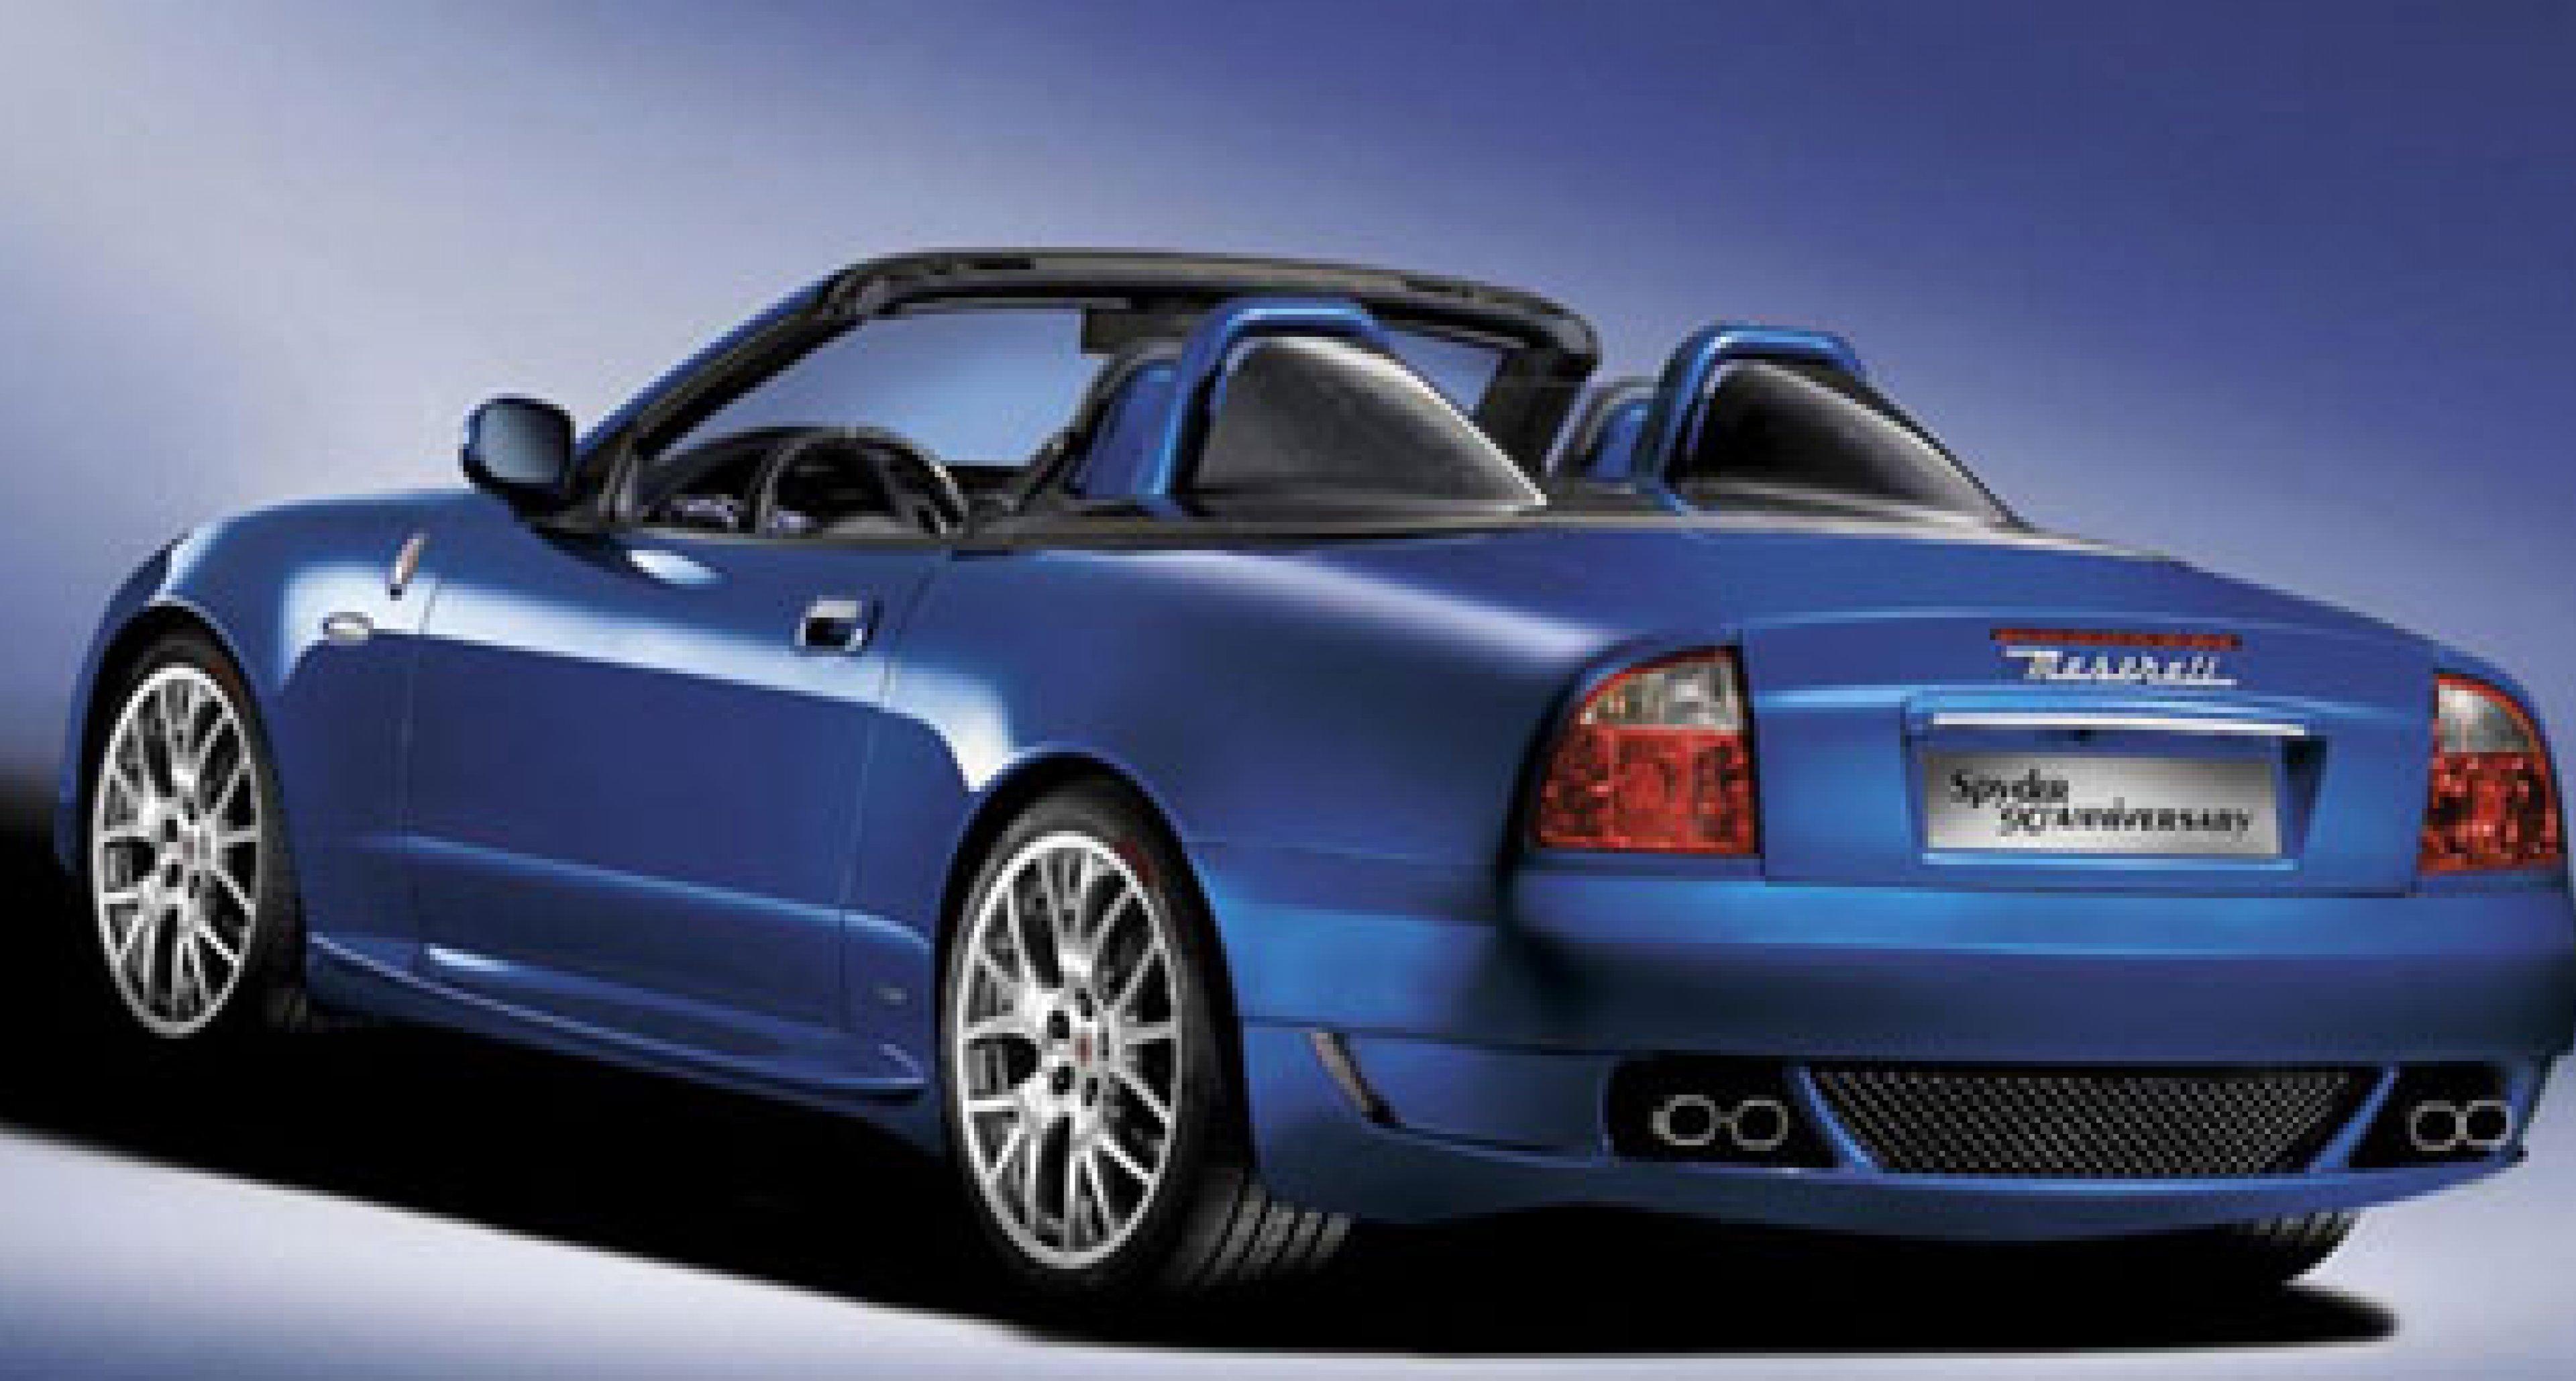 Limited Edition Spyder to Commemorate Maserati's 90th Anniversary